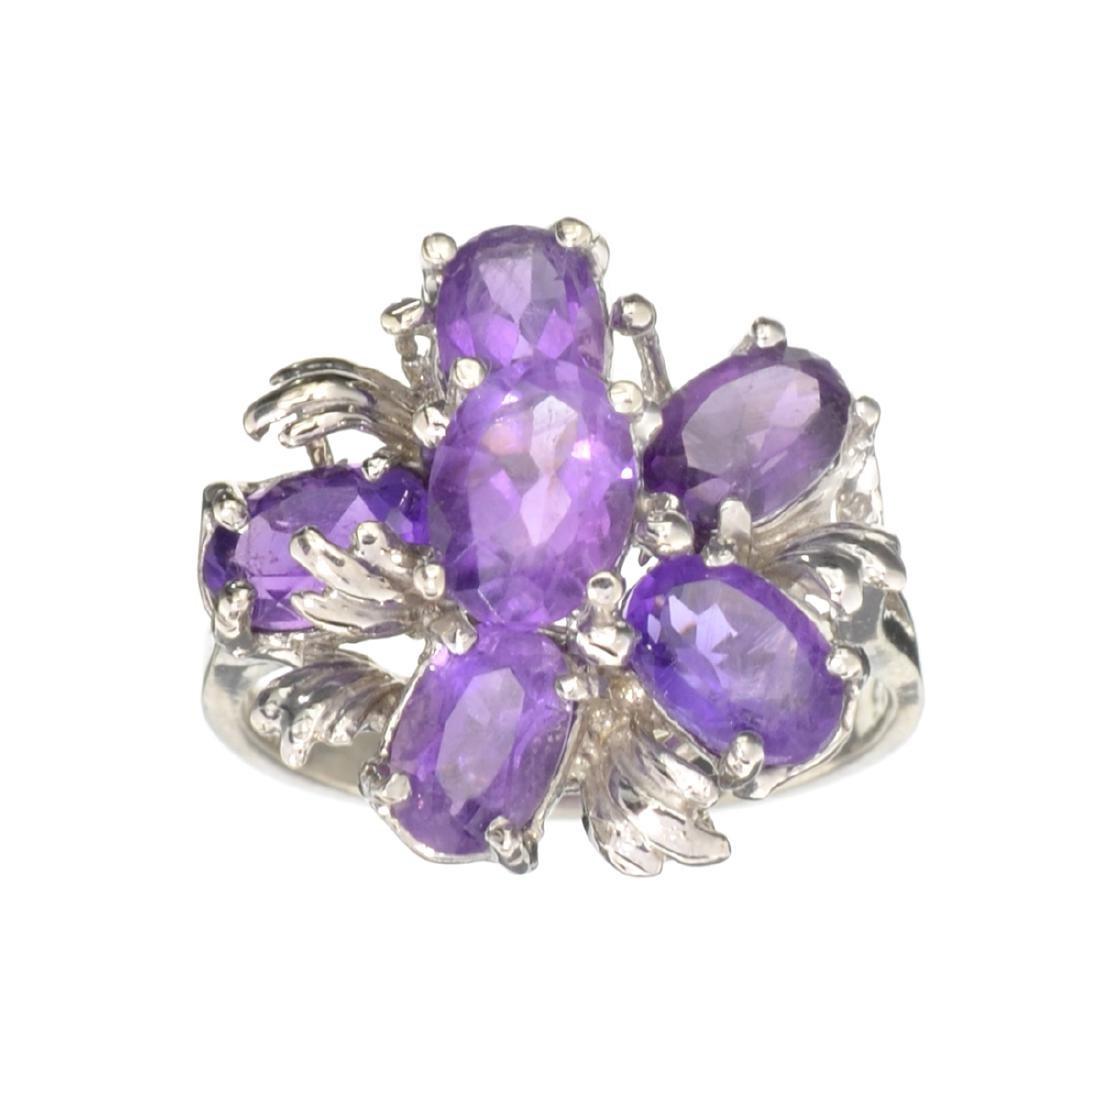 APP: 0.5k Fine Jewelry Designer Sebastian, 2.10CT Oval